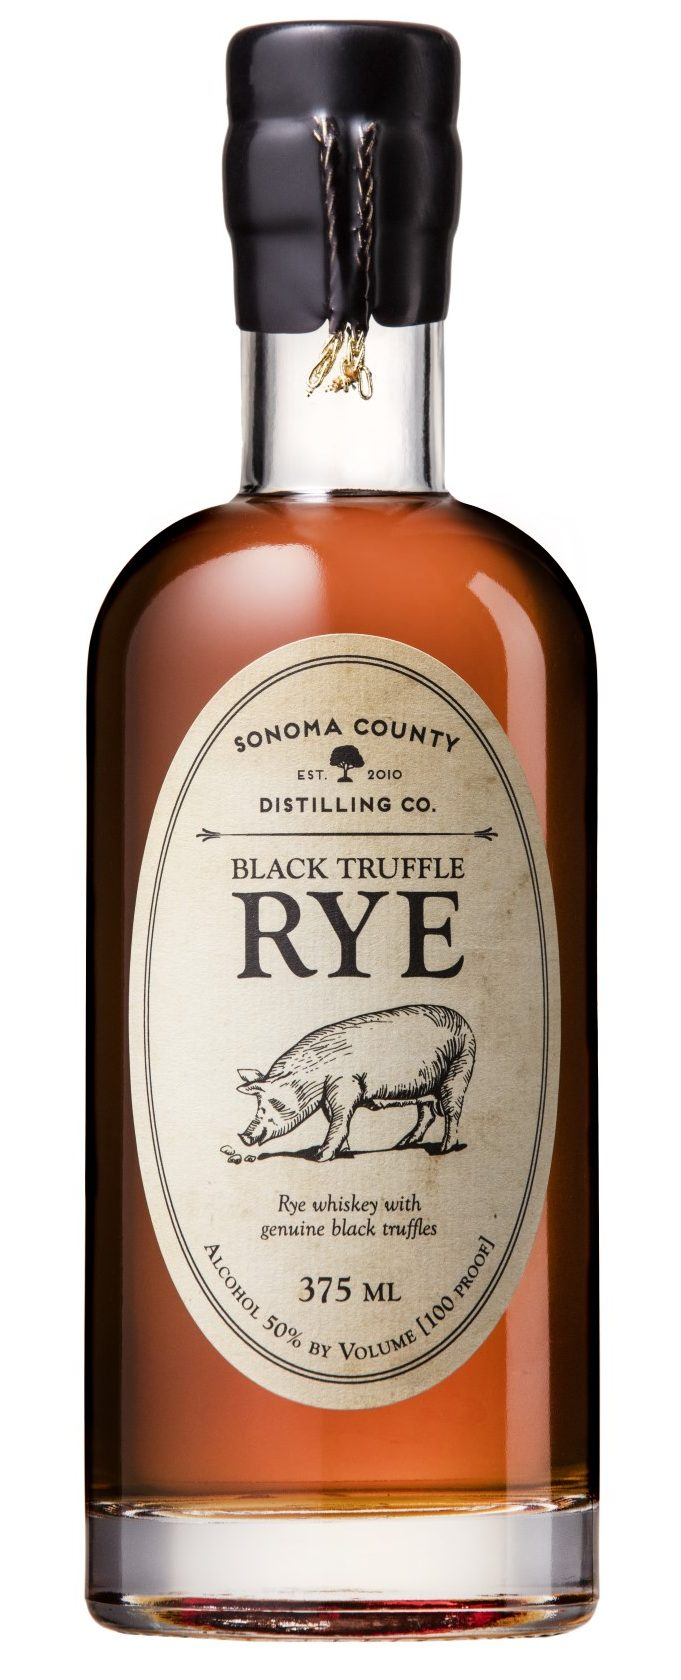 Sonoma County Distilling Co. Black Truffle Rye